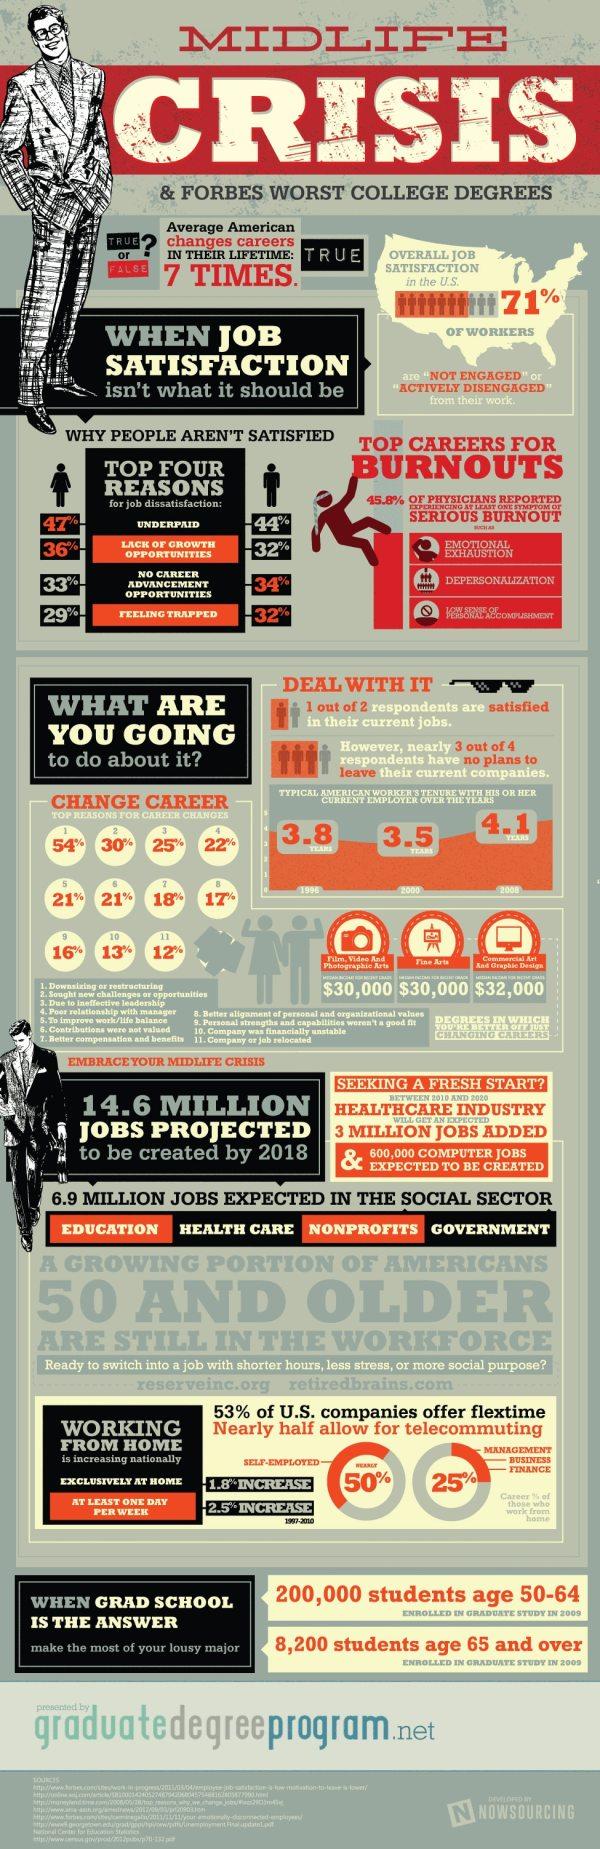 Midlife Crisis Infographic